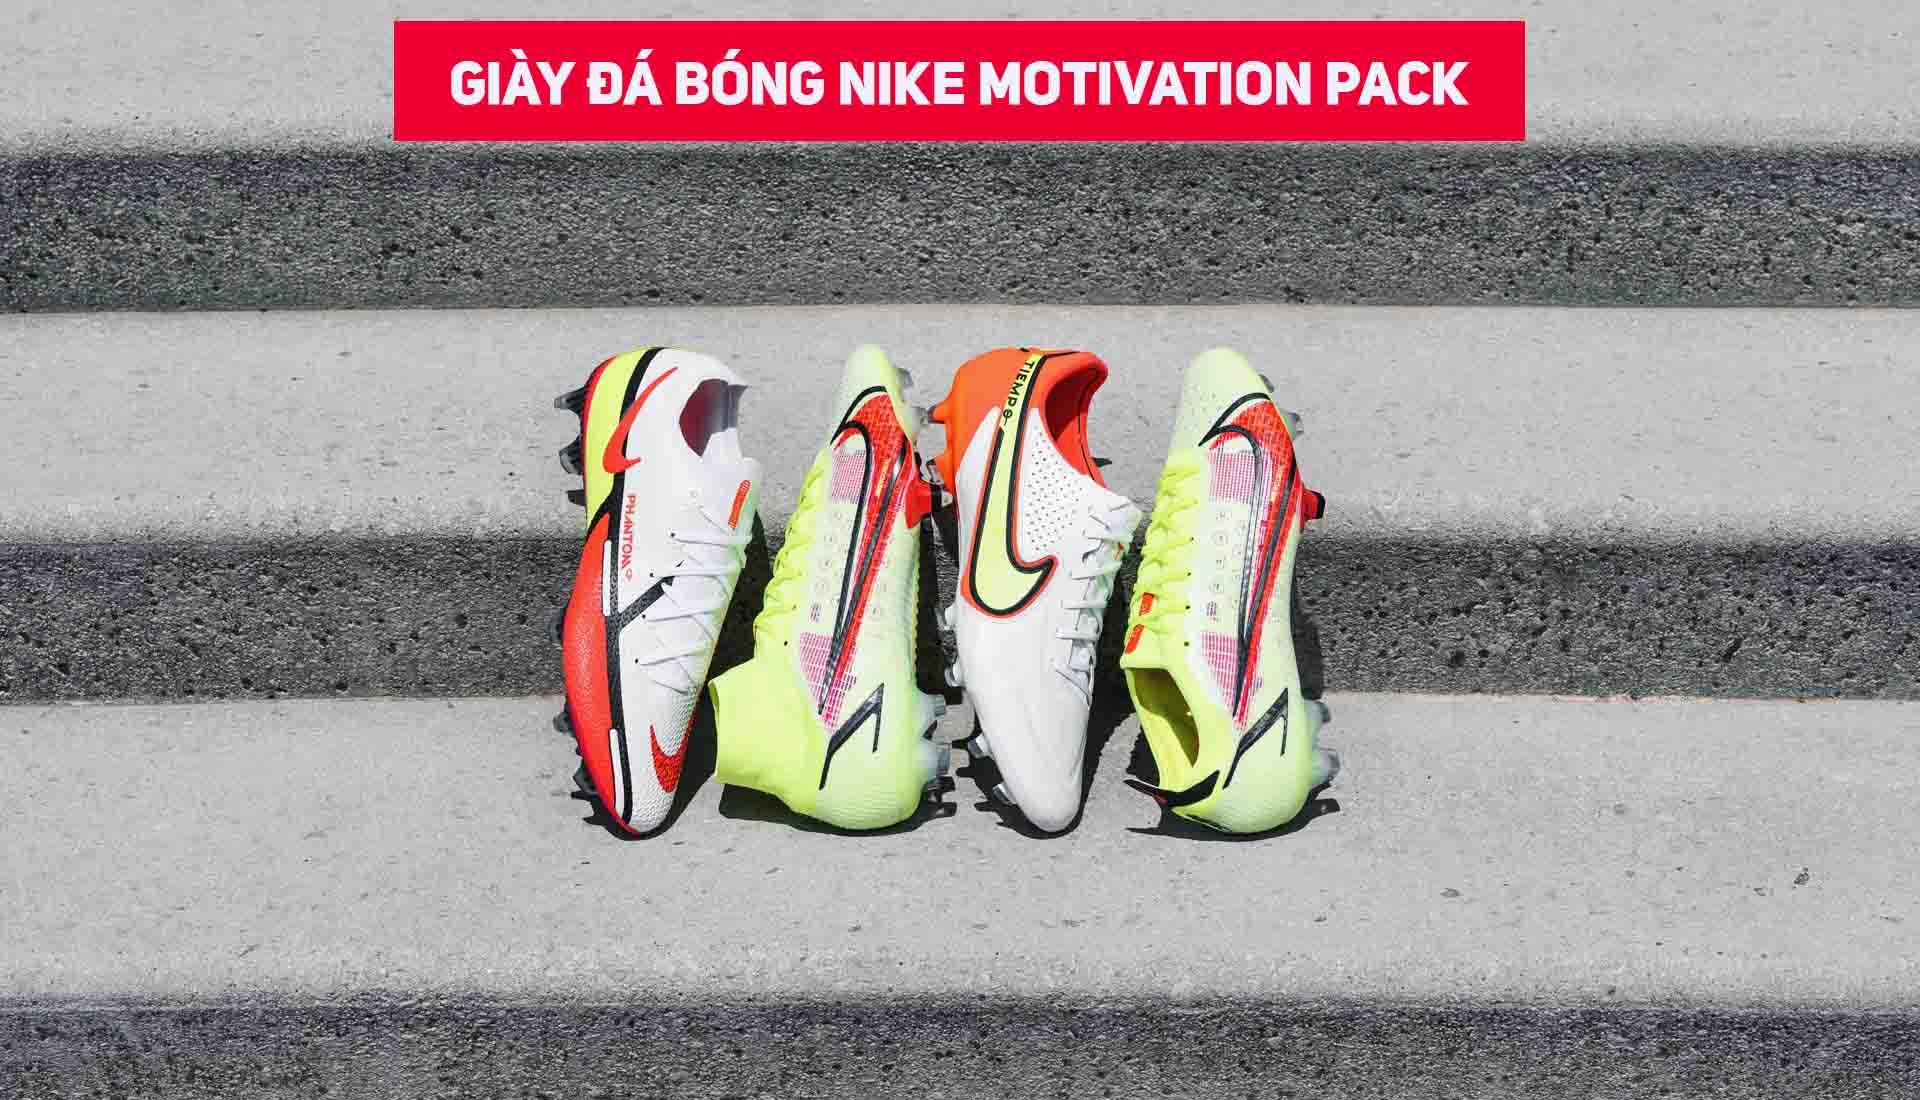 giay da bong nike Motivation Pack (22)